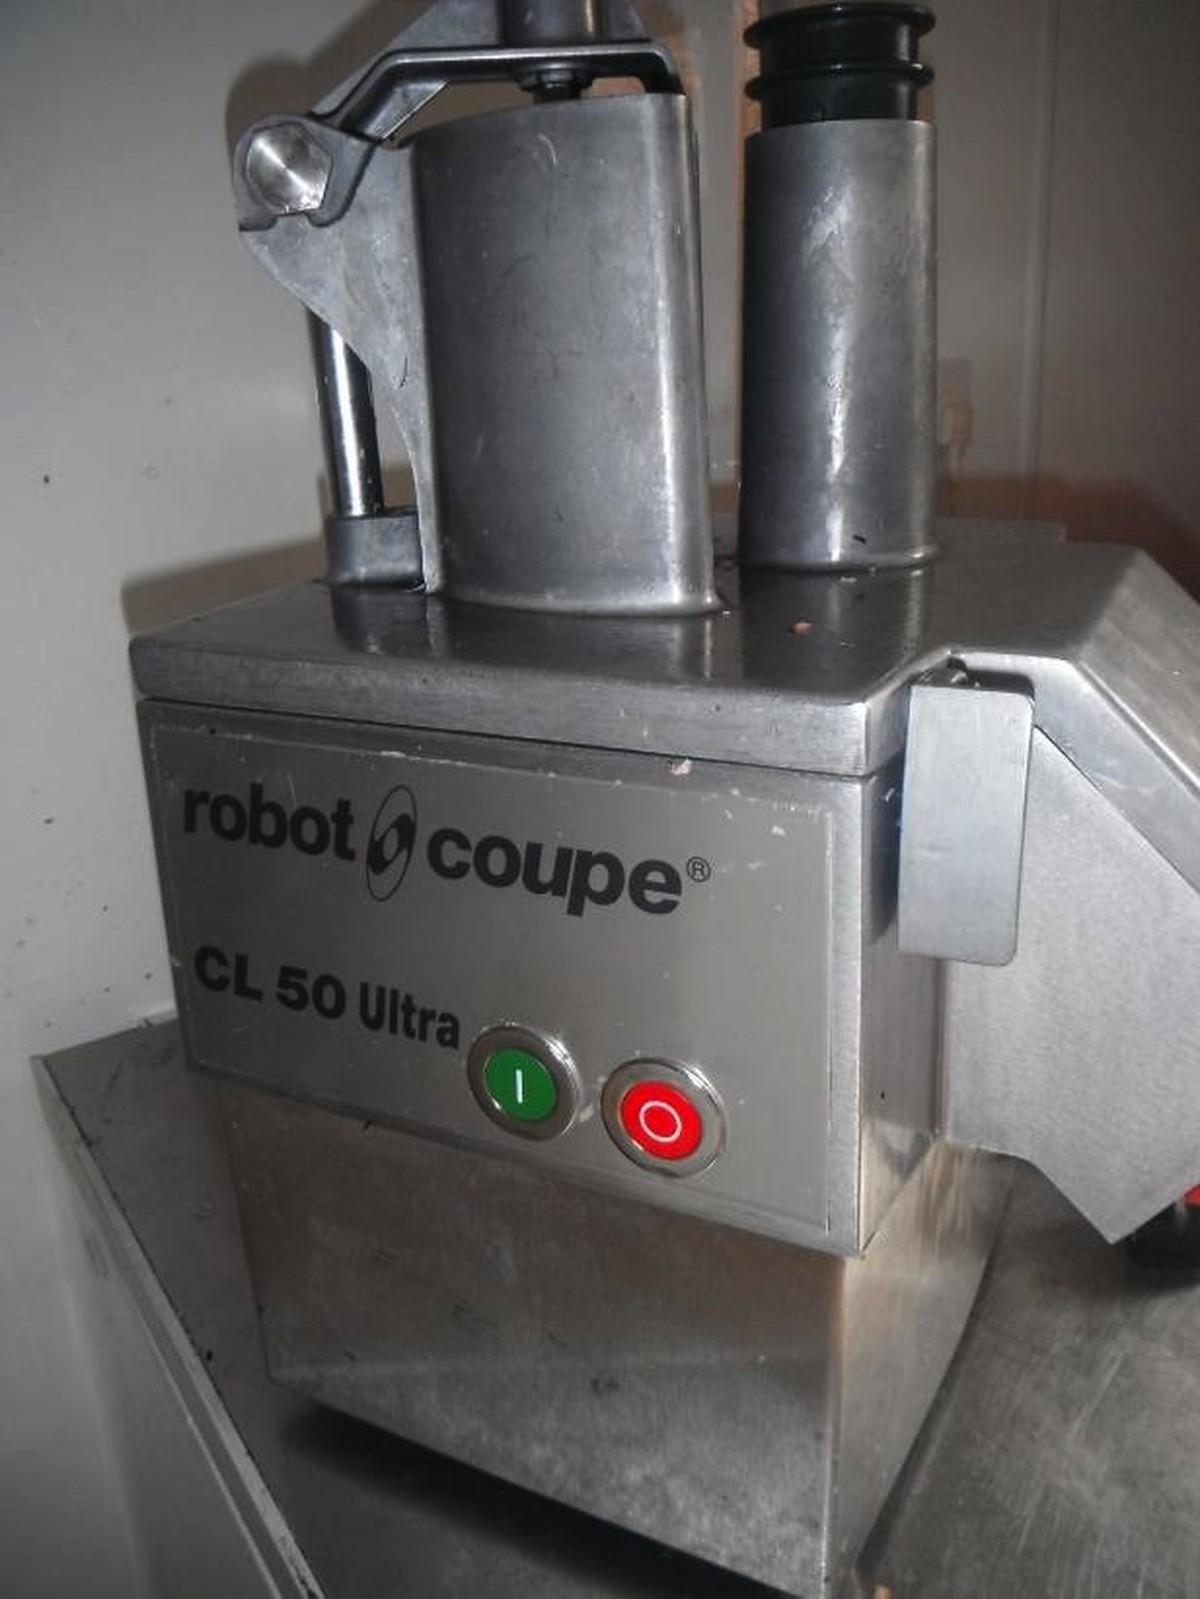 secondhand catering equipment food prep robot coupe vegetable prep machine cl50 ultra carlisle. Black Bedroom Furniture Sets. Home Design Ideas